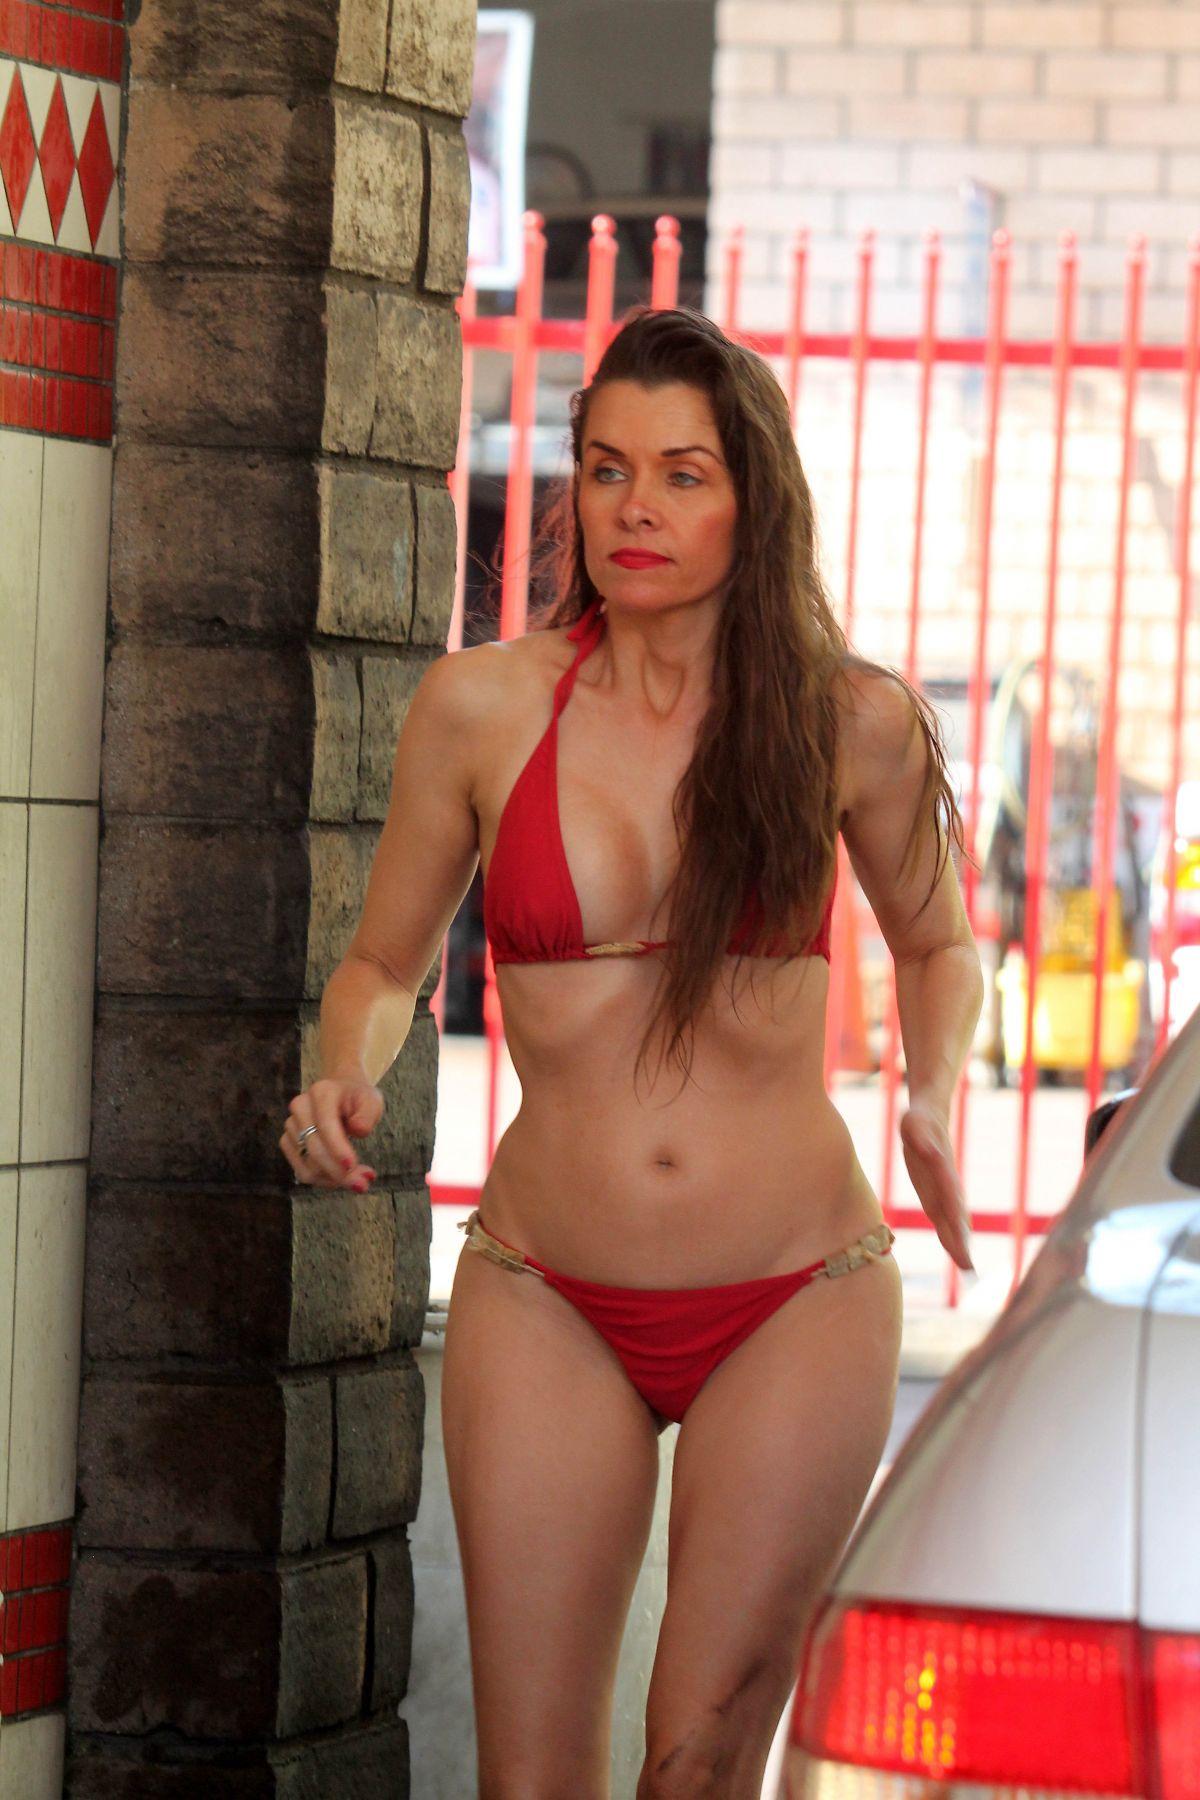 Alicia Arden Bikini naked 297